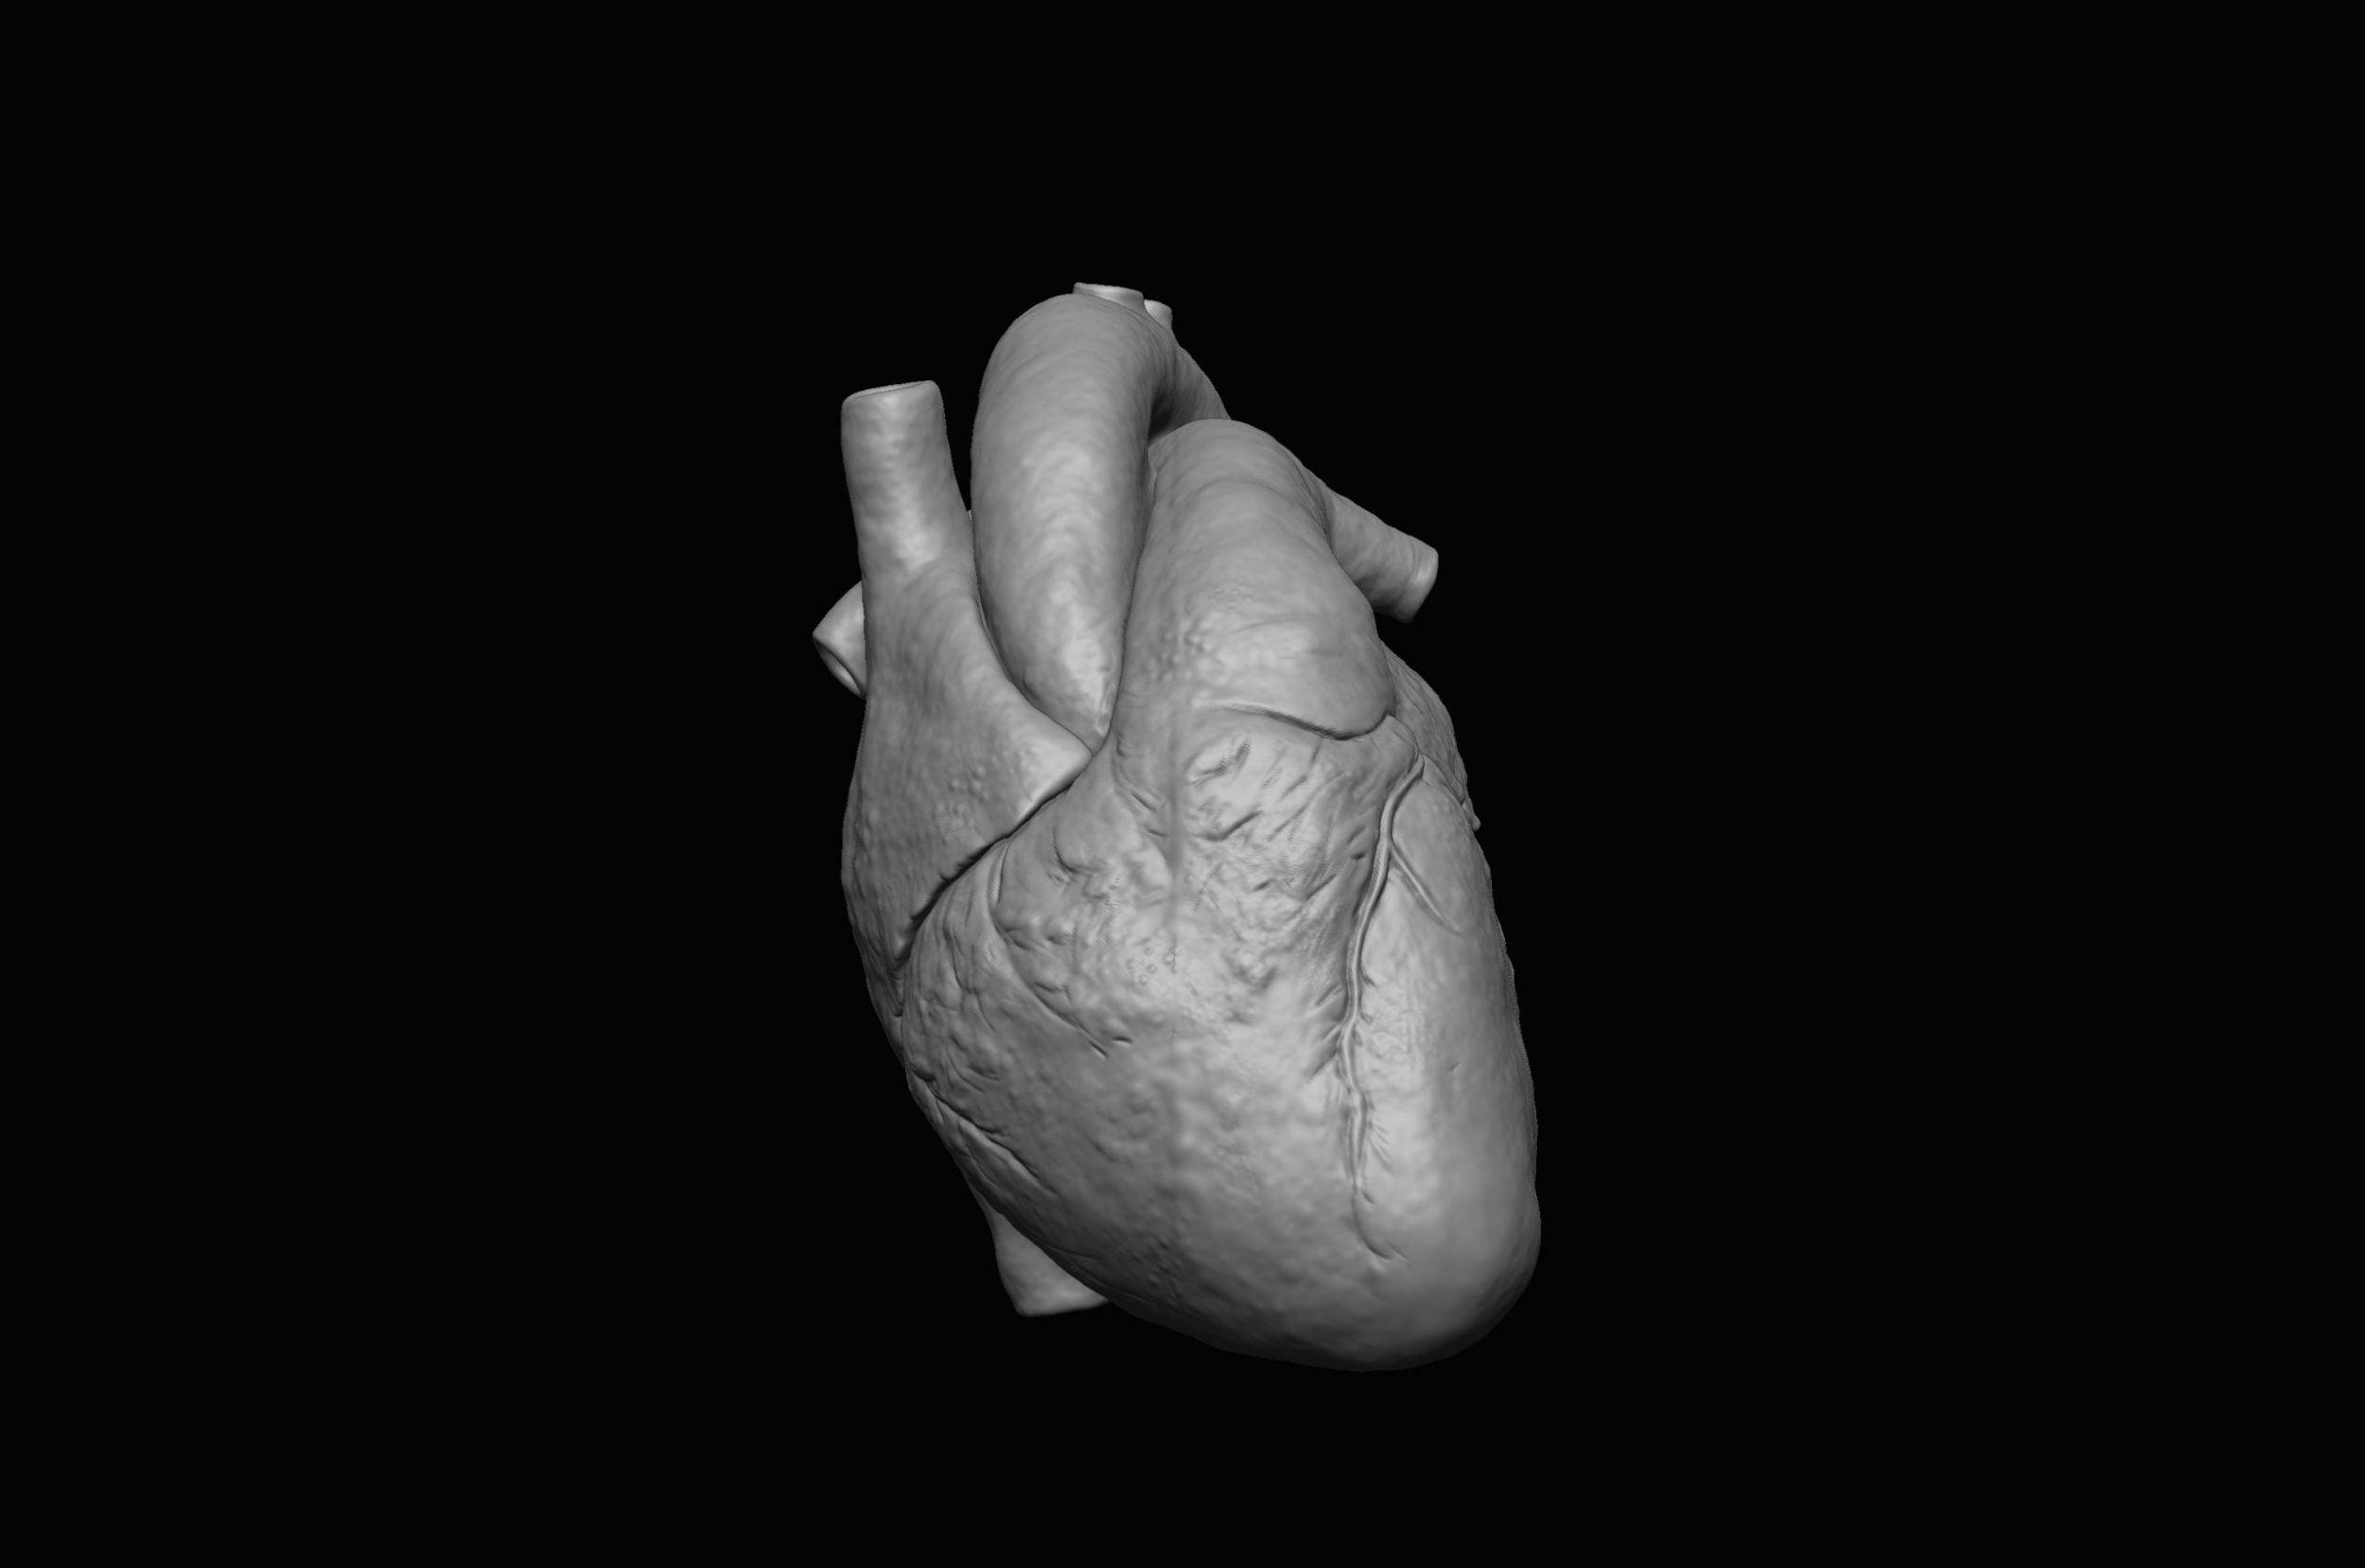 60 scaled SA Anatomy | Study Anatomy in 3D